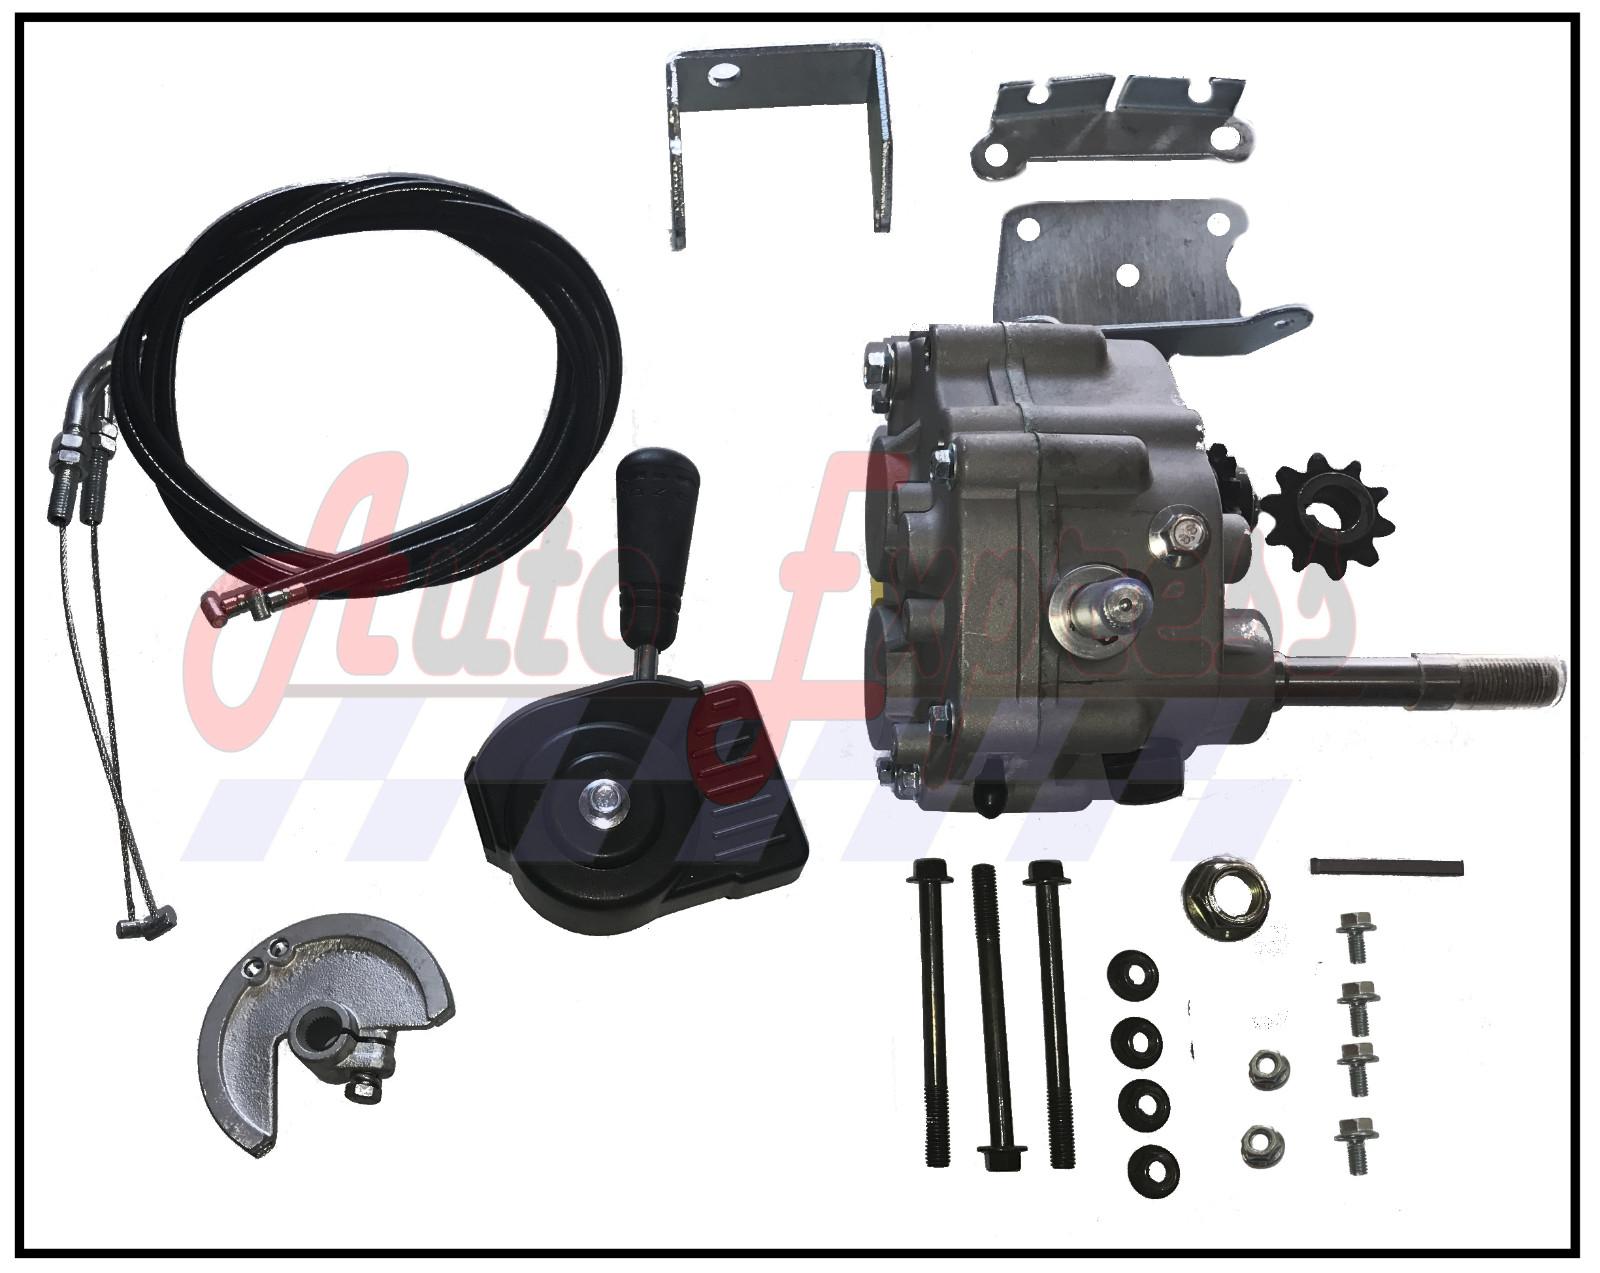 parts of a comet diagram bt openreach master socket wiring go kart forward reverse gear box fit 3/4